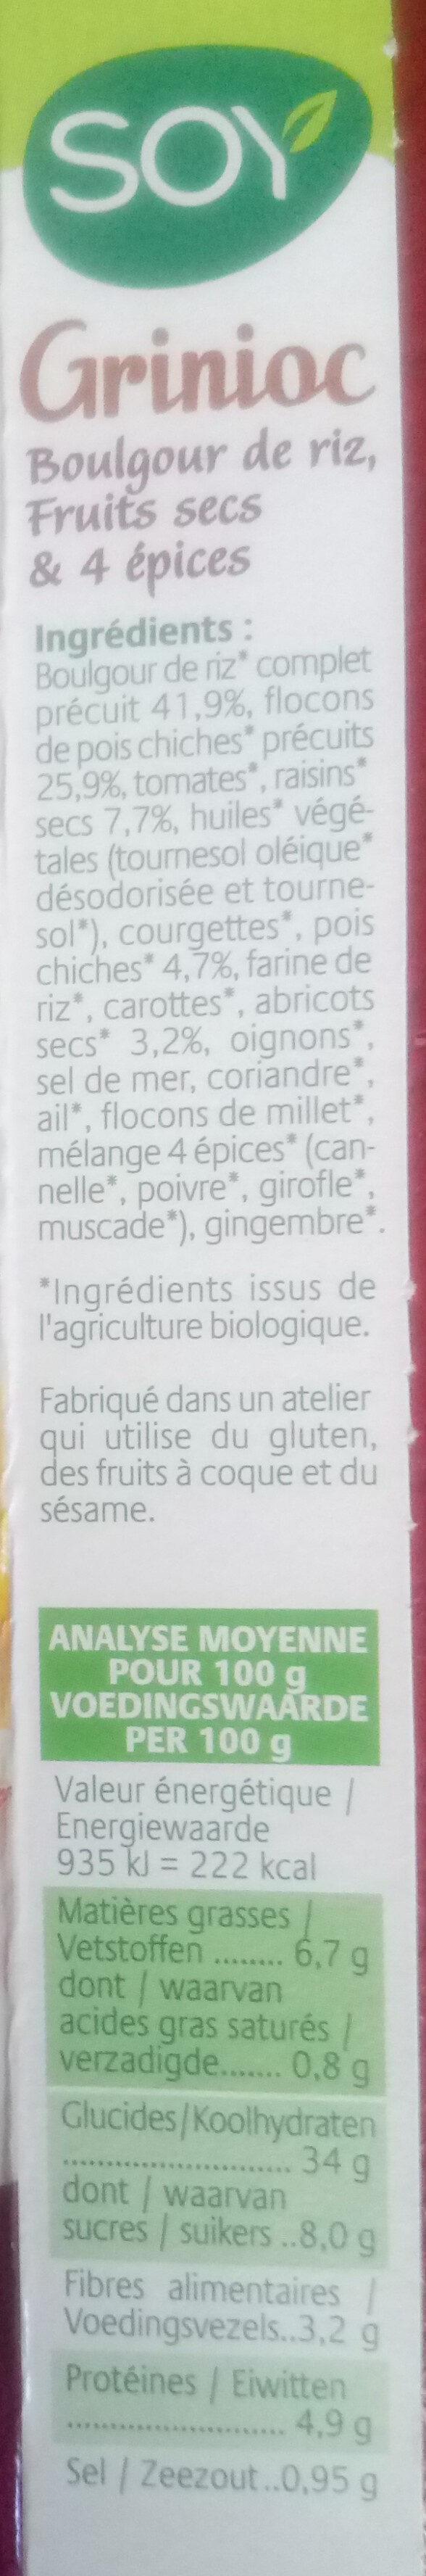 Grignioc - Ingrédients - fr